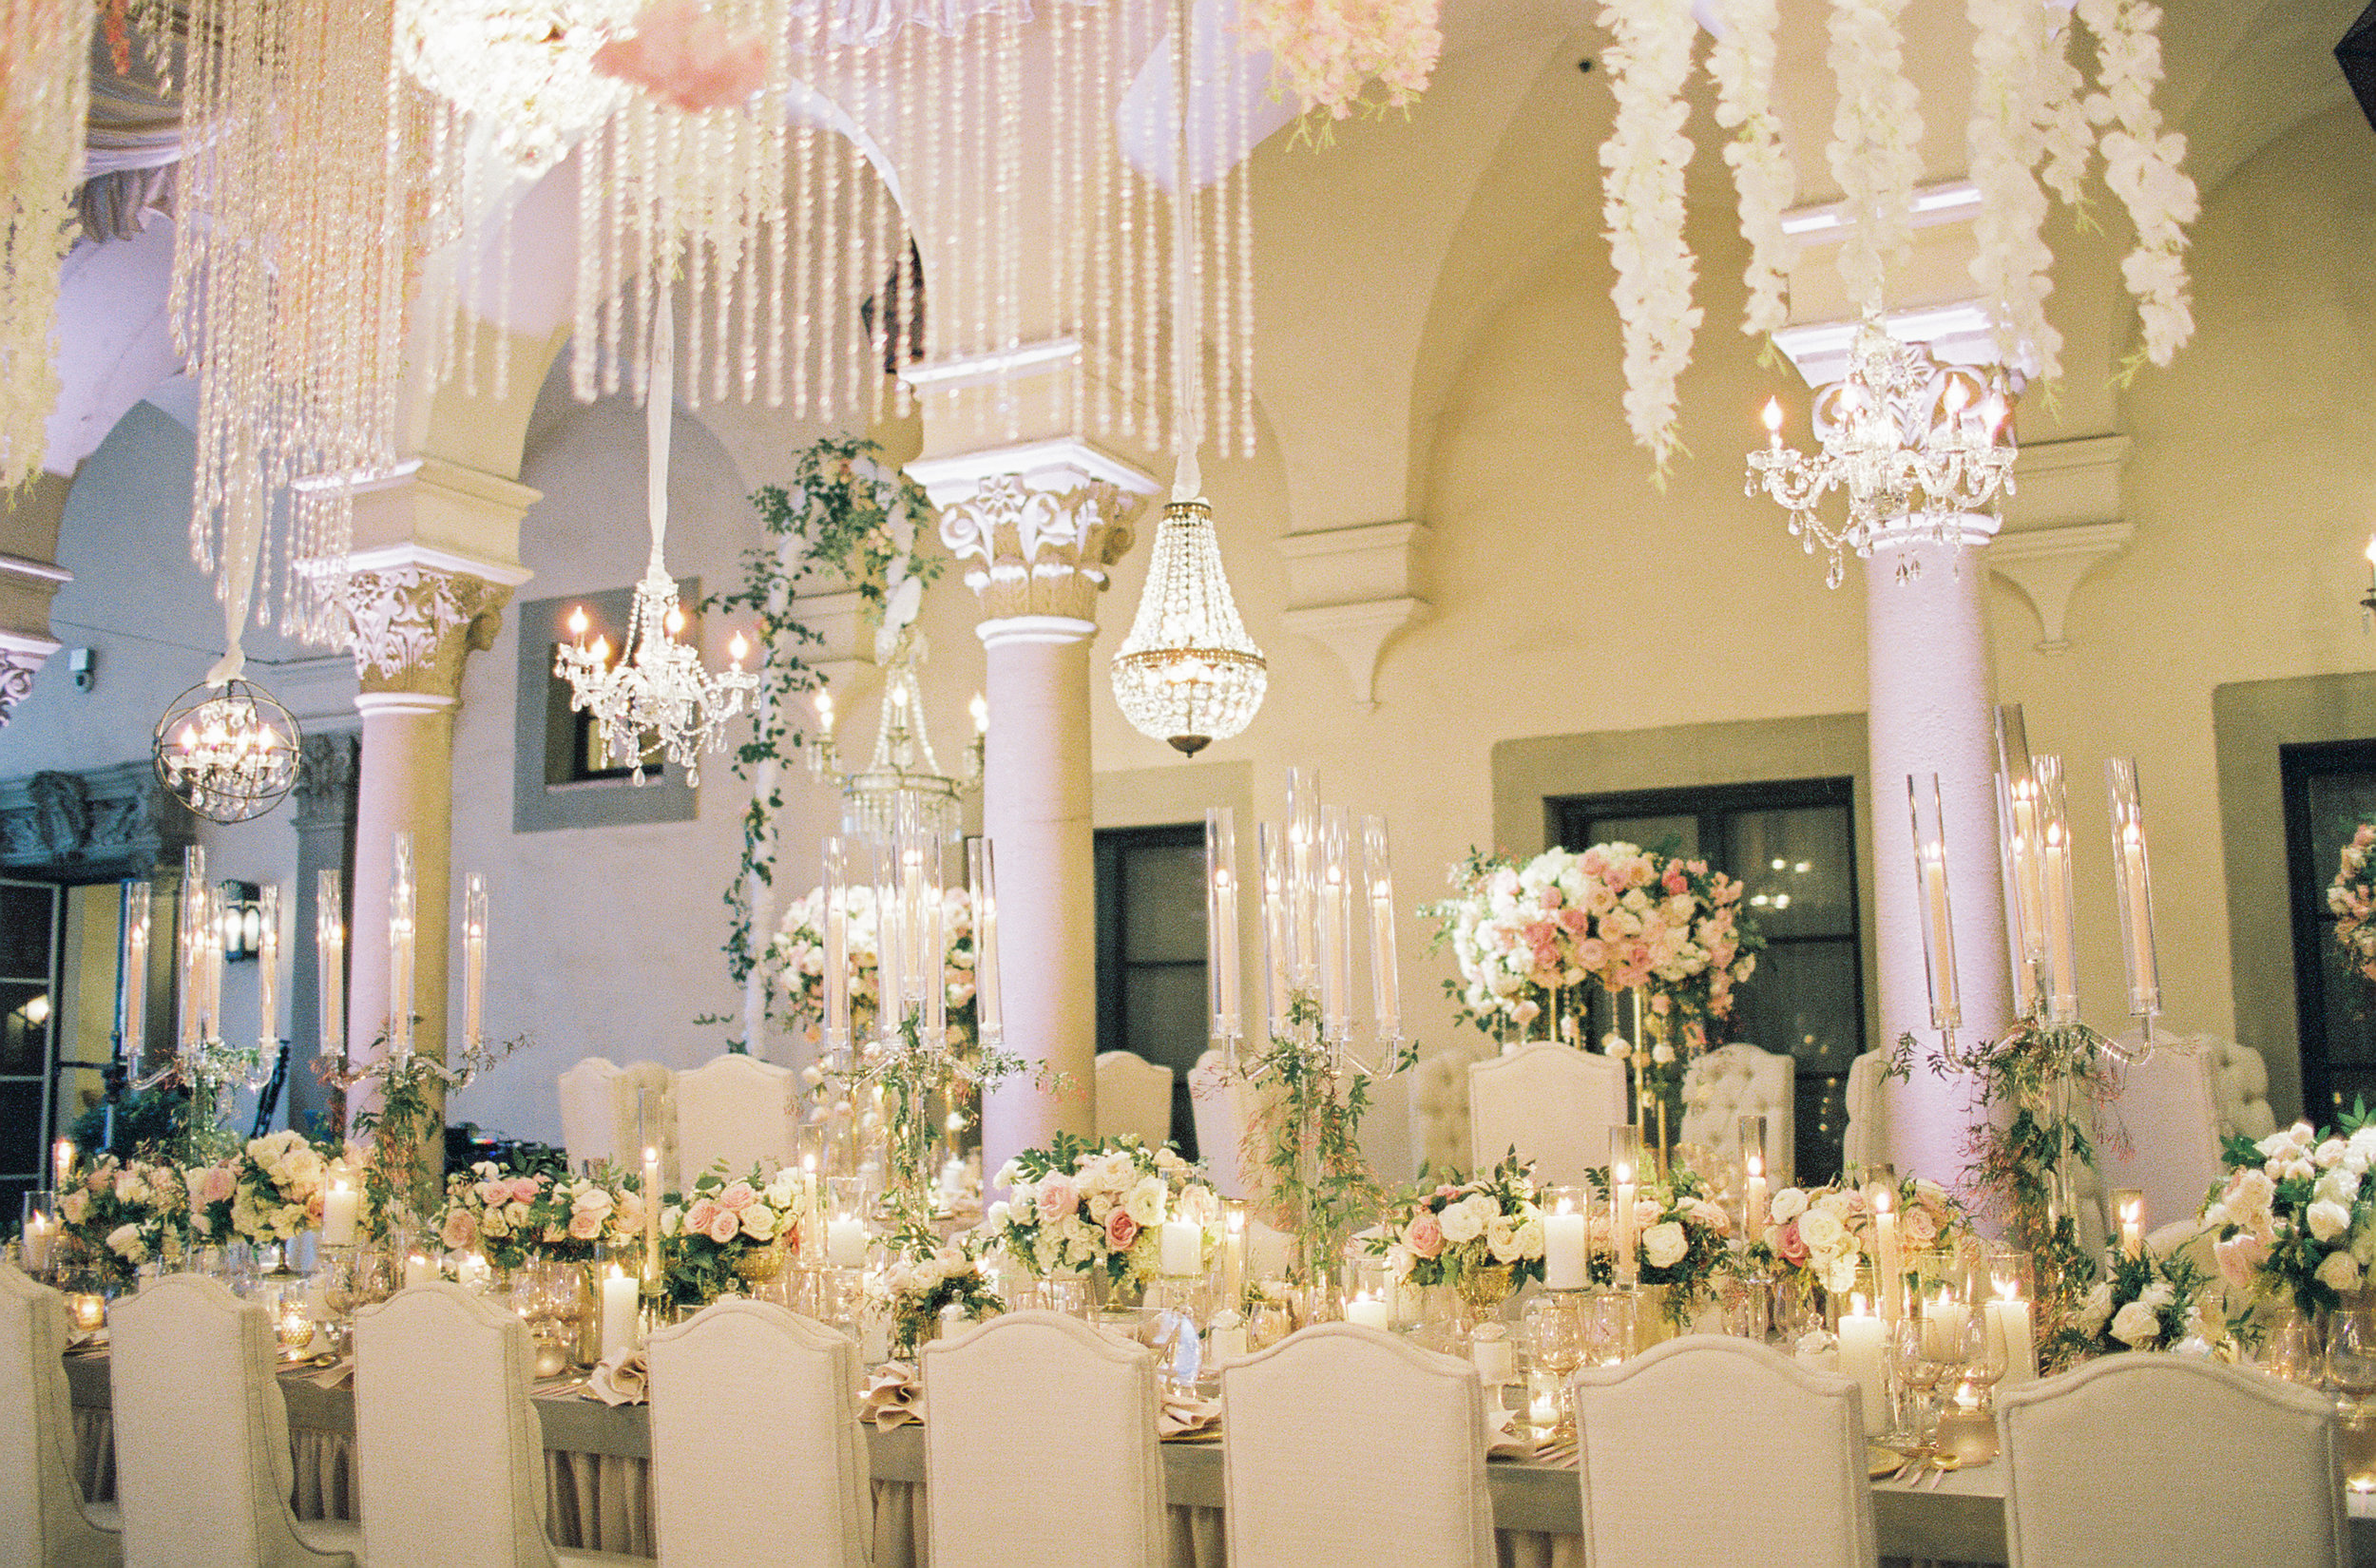 Athenaeum_Wedding_Hi_Res-88-Jen_Huang-005180-R1-027.jpg